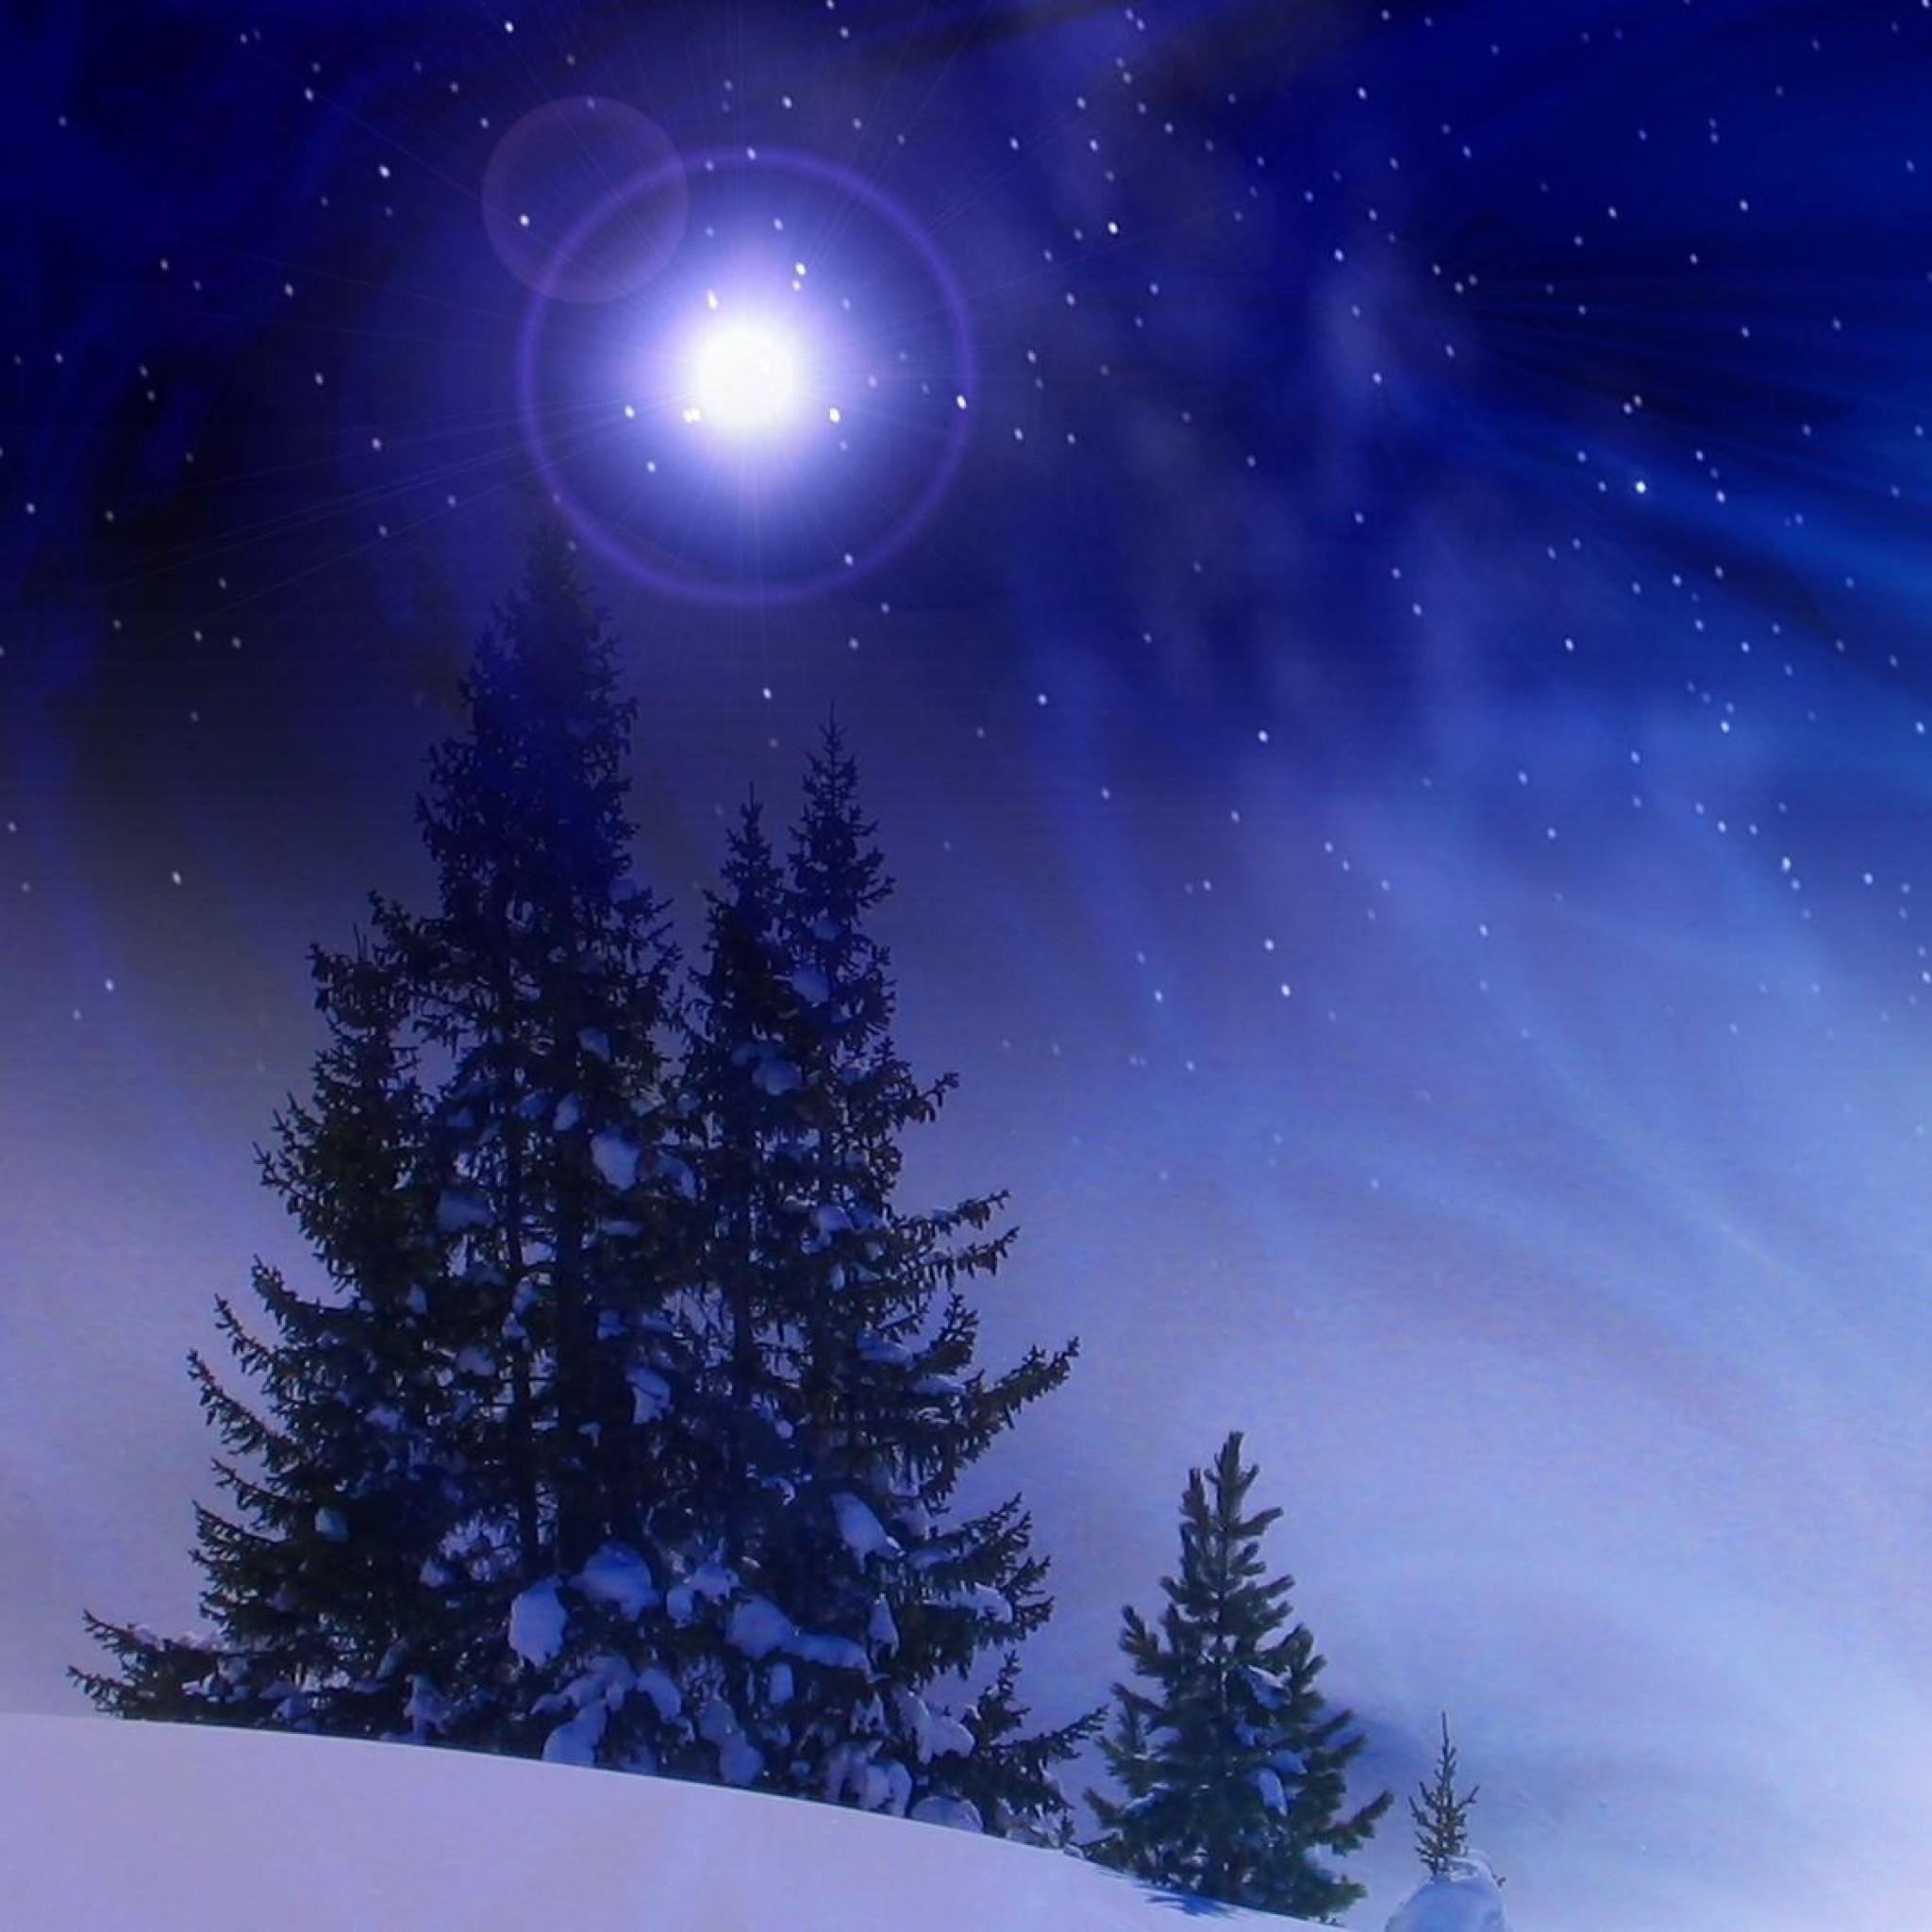 Snow Live Wallpaper: Christmas Tree Snow Wallpaper (73+ Images